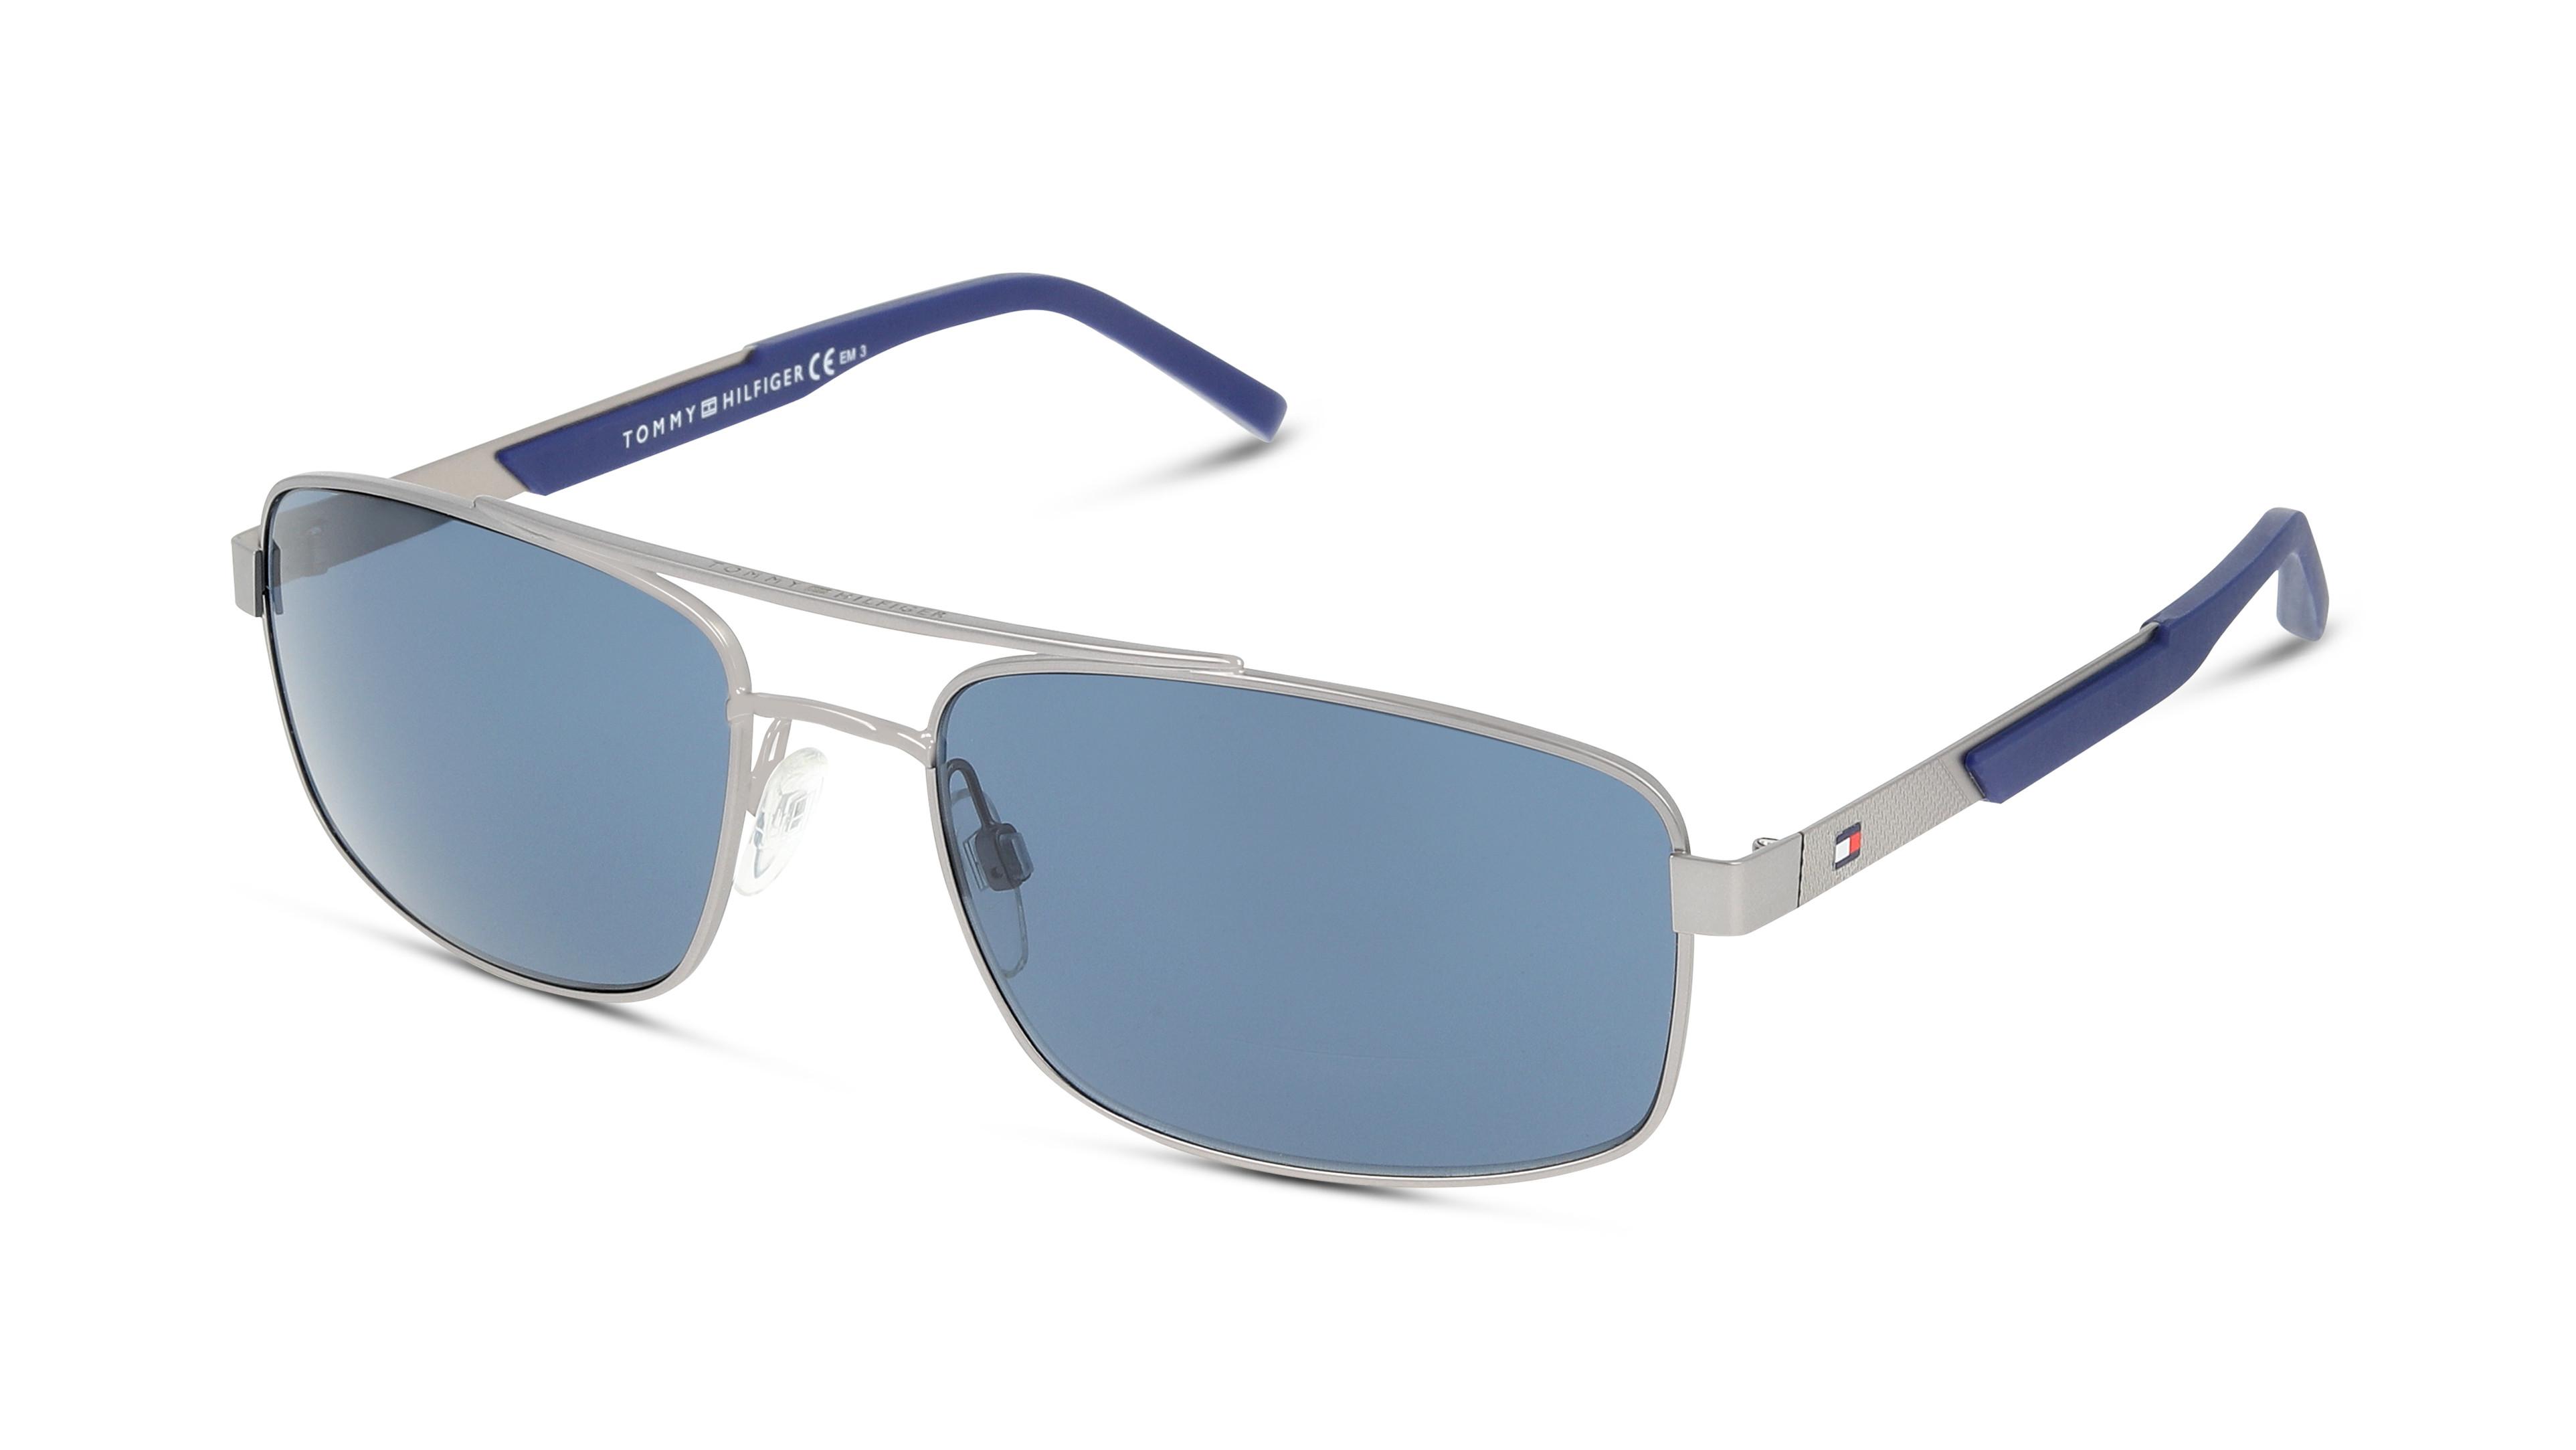 716736194578-angle-03-tommy-hilfiger-th-1674-s-eyewear-mtt-ruthe